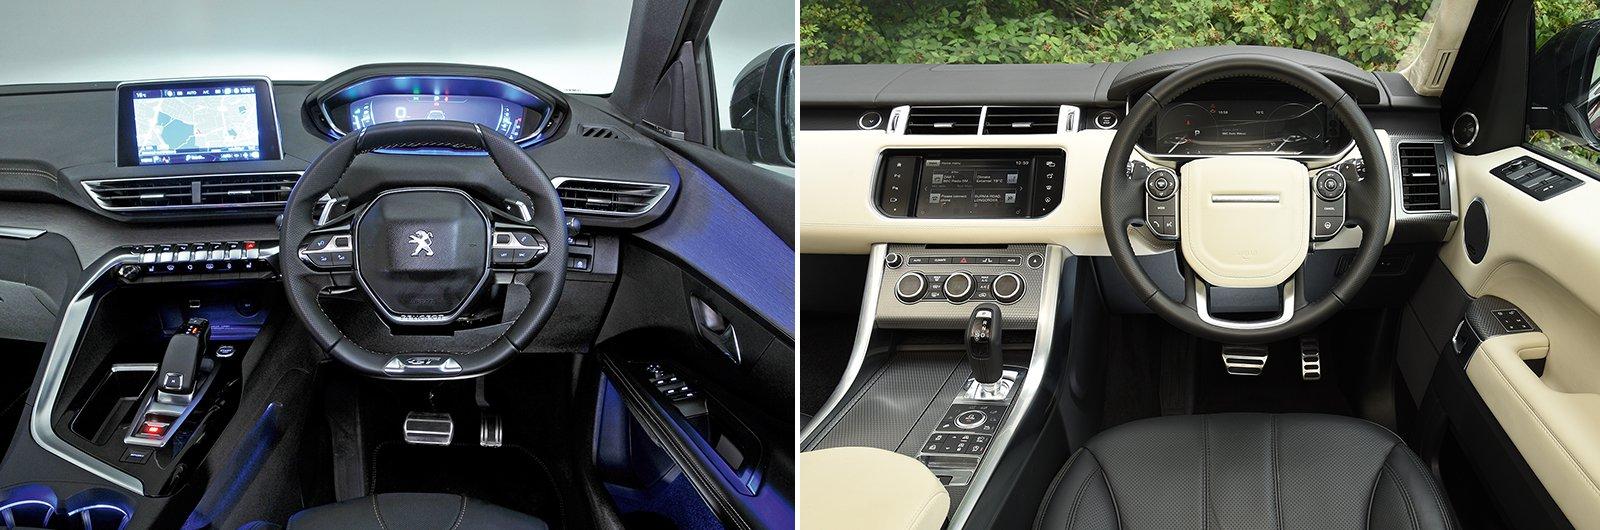 new Peugeot 5008 vs used Range Rover Sport dashboard